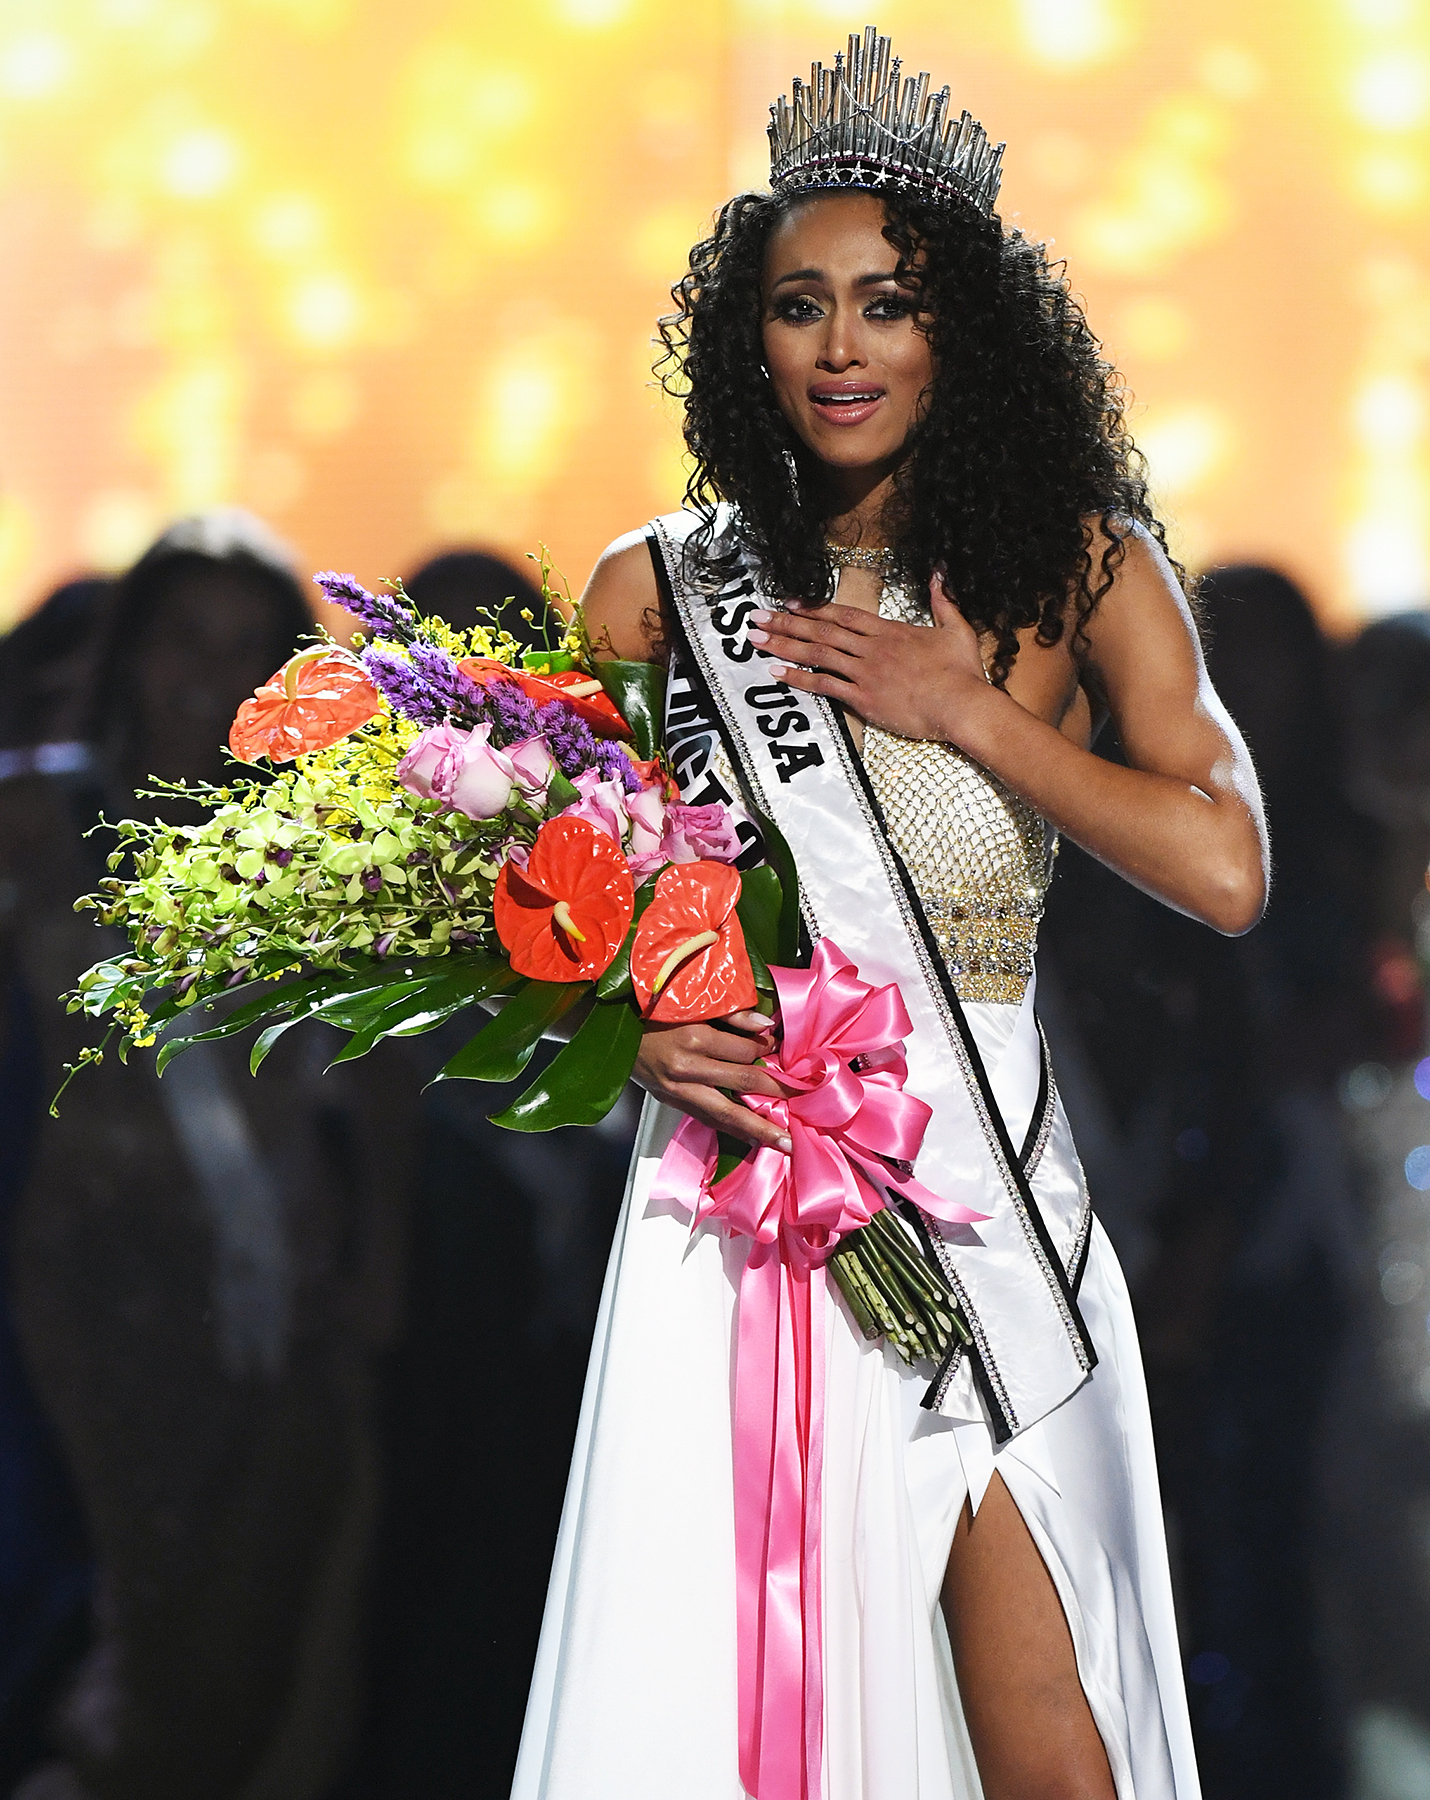 Miss District of Columbia USA 2017 Kara McCullough